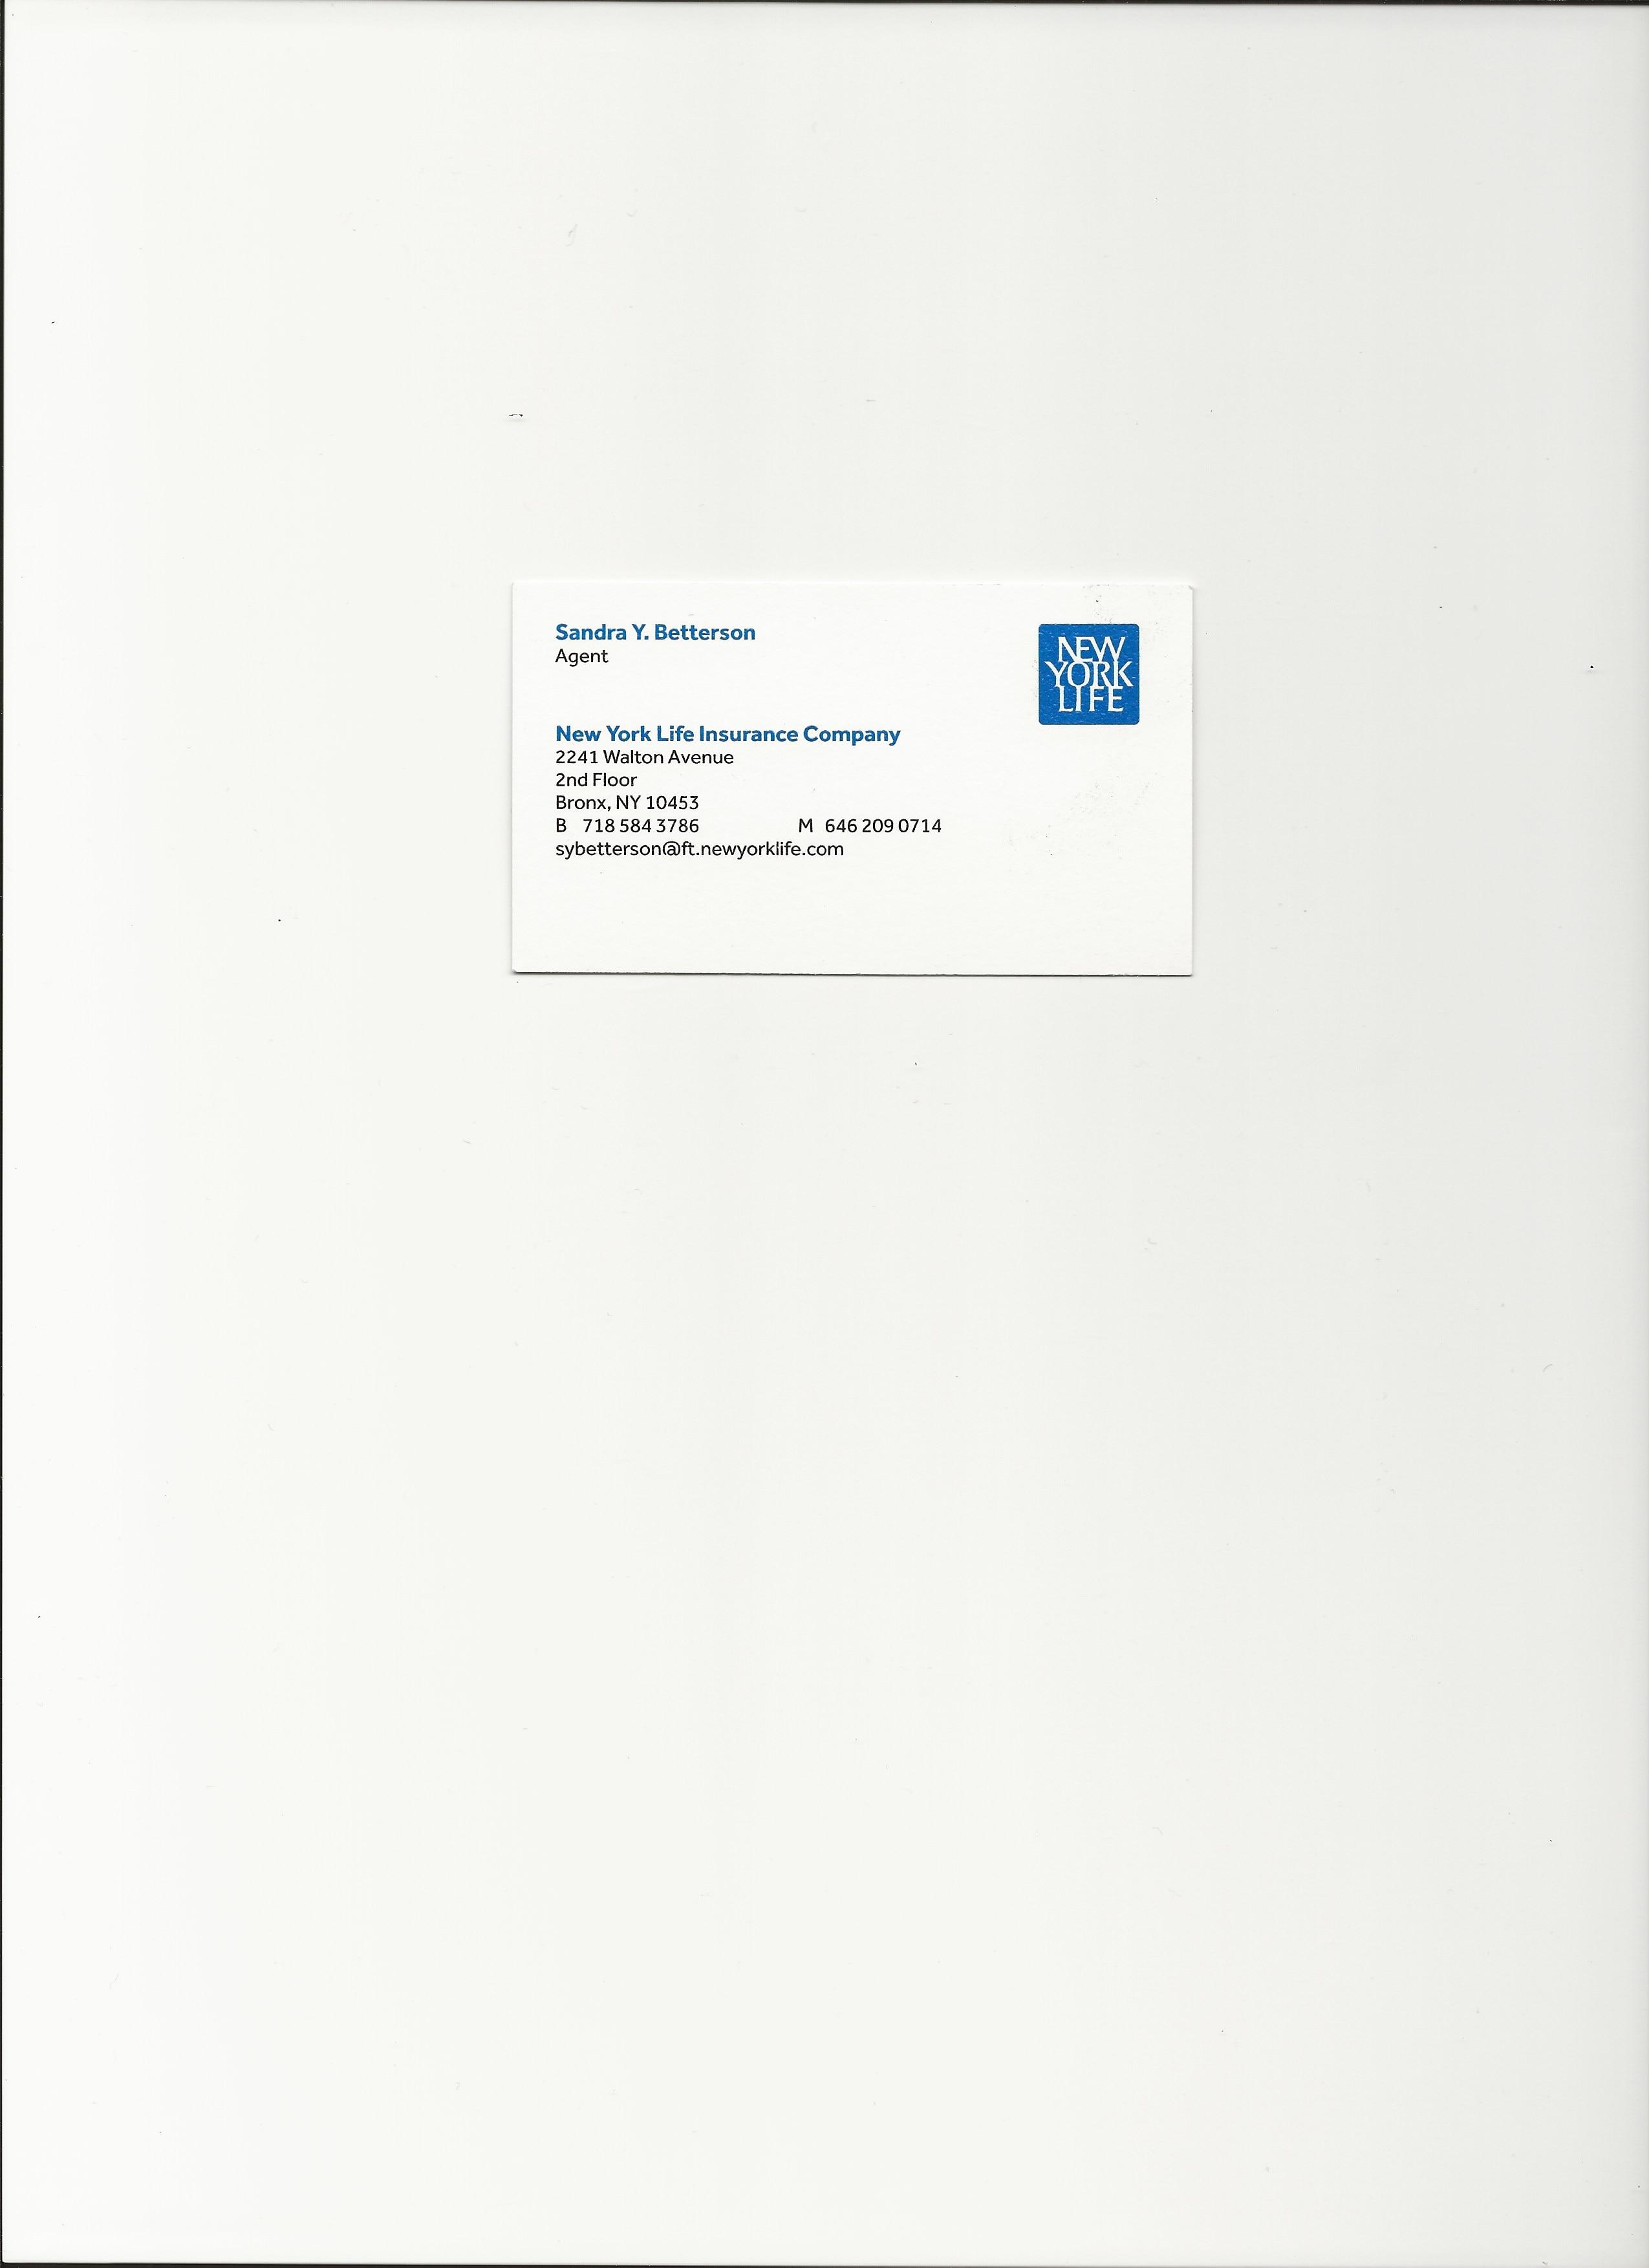 SANDRA YVETTE BETTERSON  Your Financial Professional & Insurance Agent